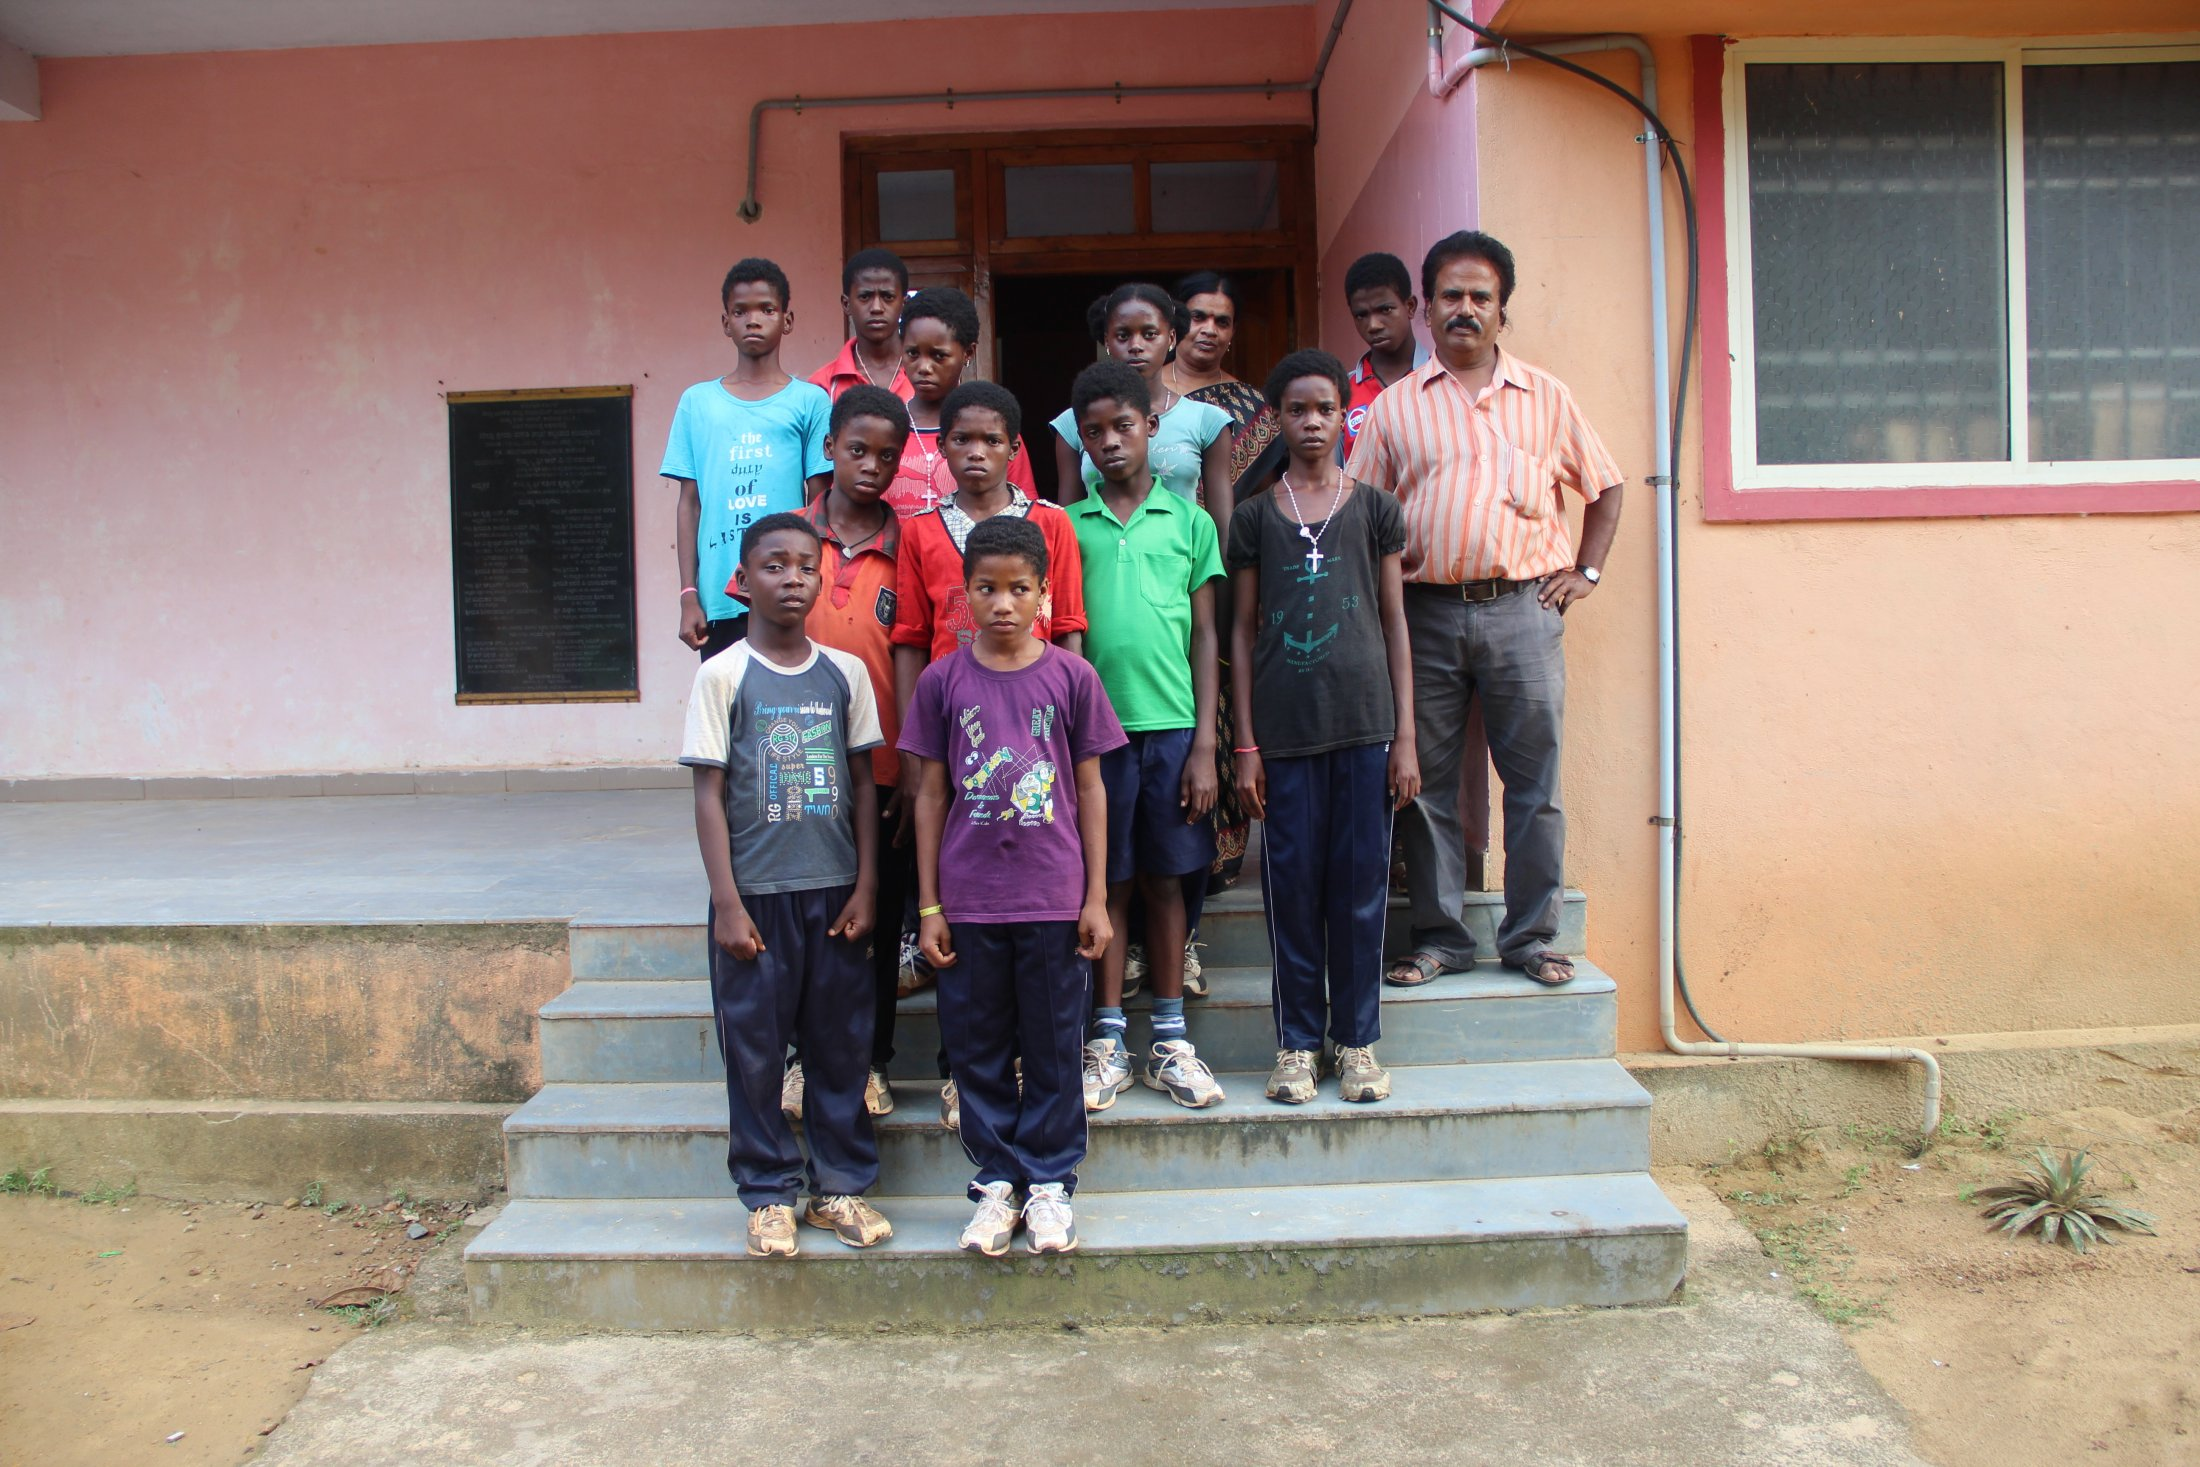 Sidi Athletes in the Karnataka Sports Academy, Karwar